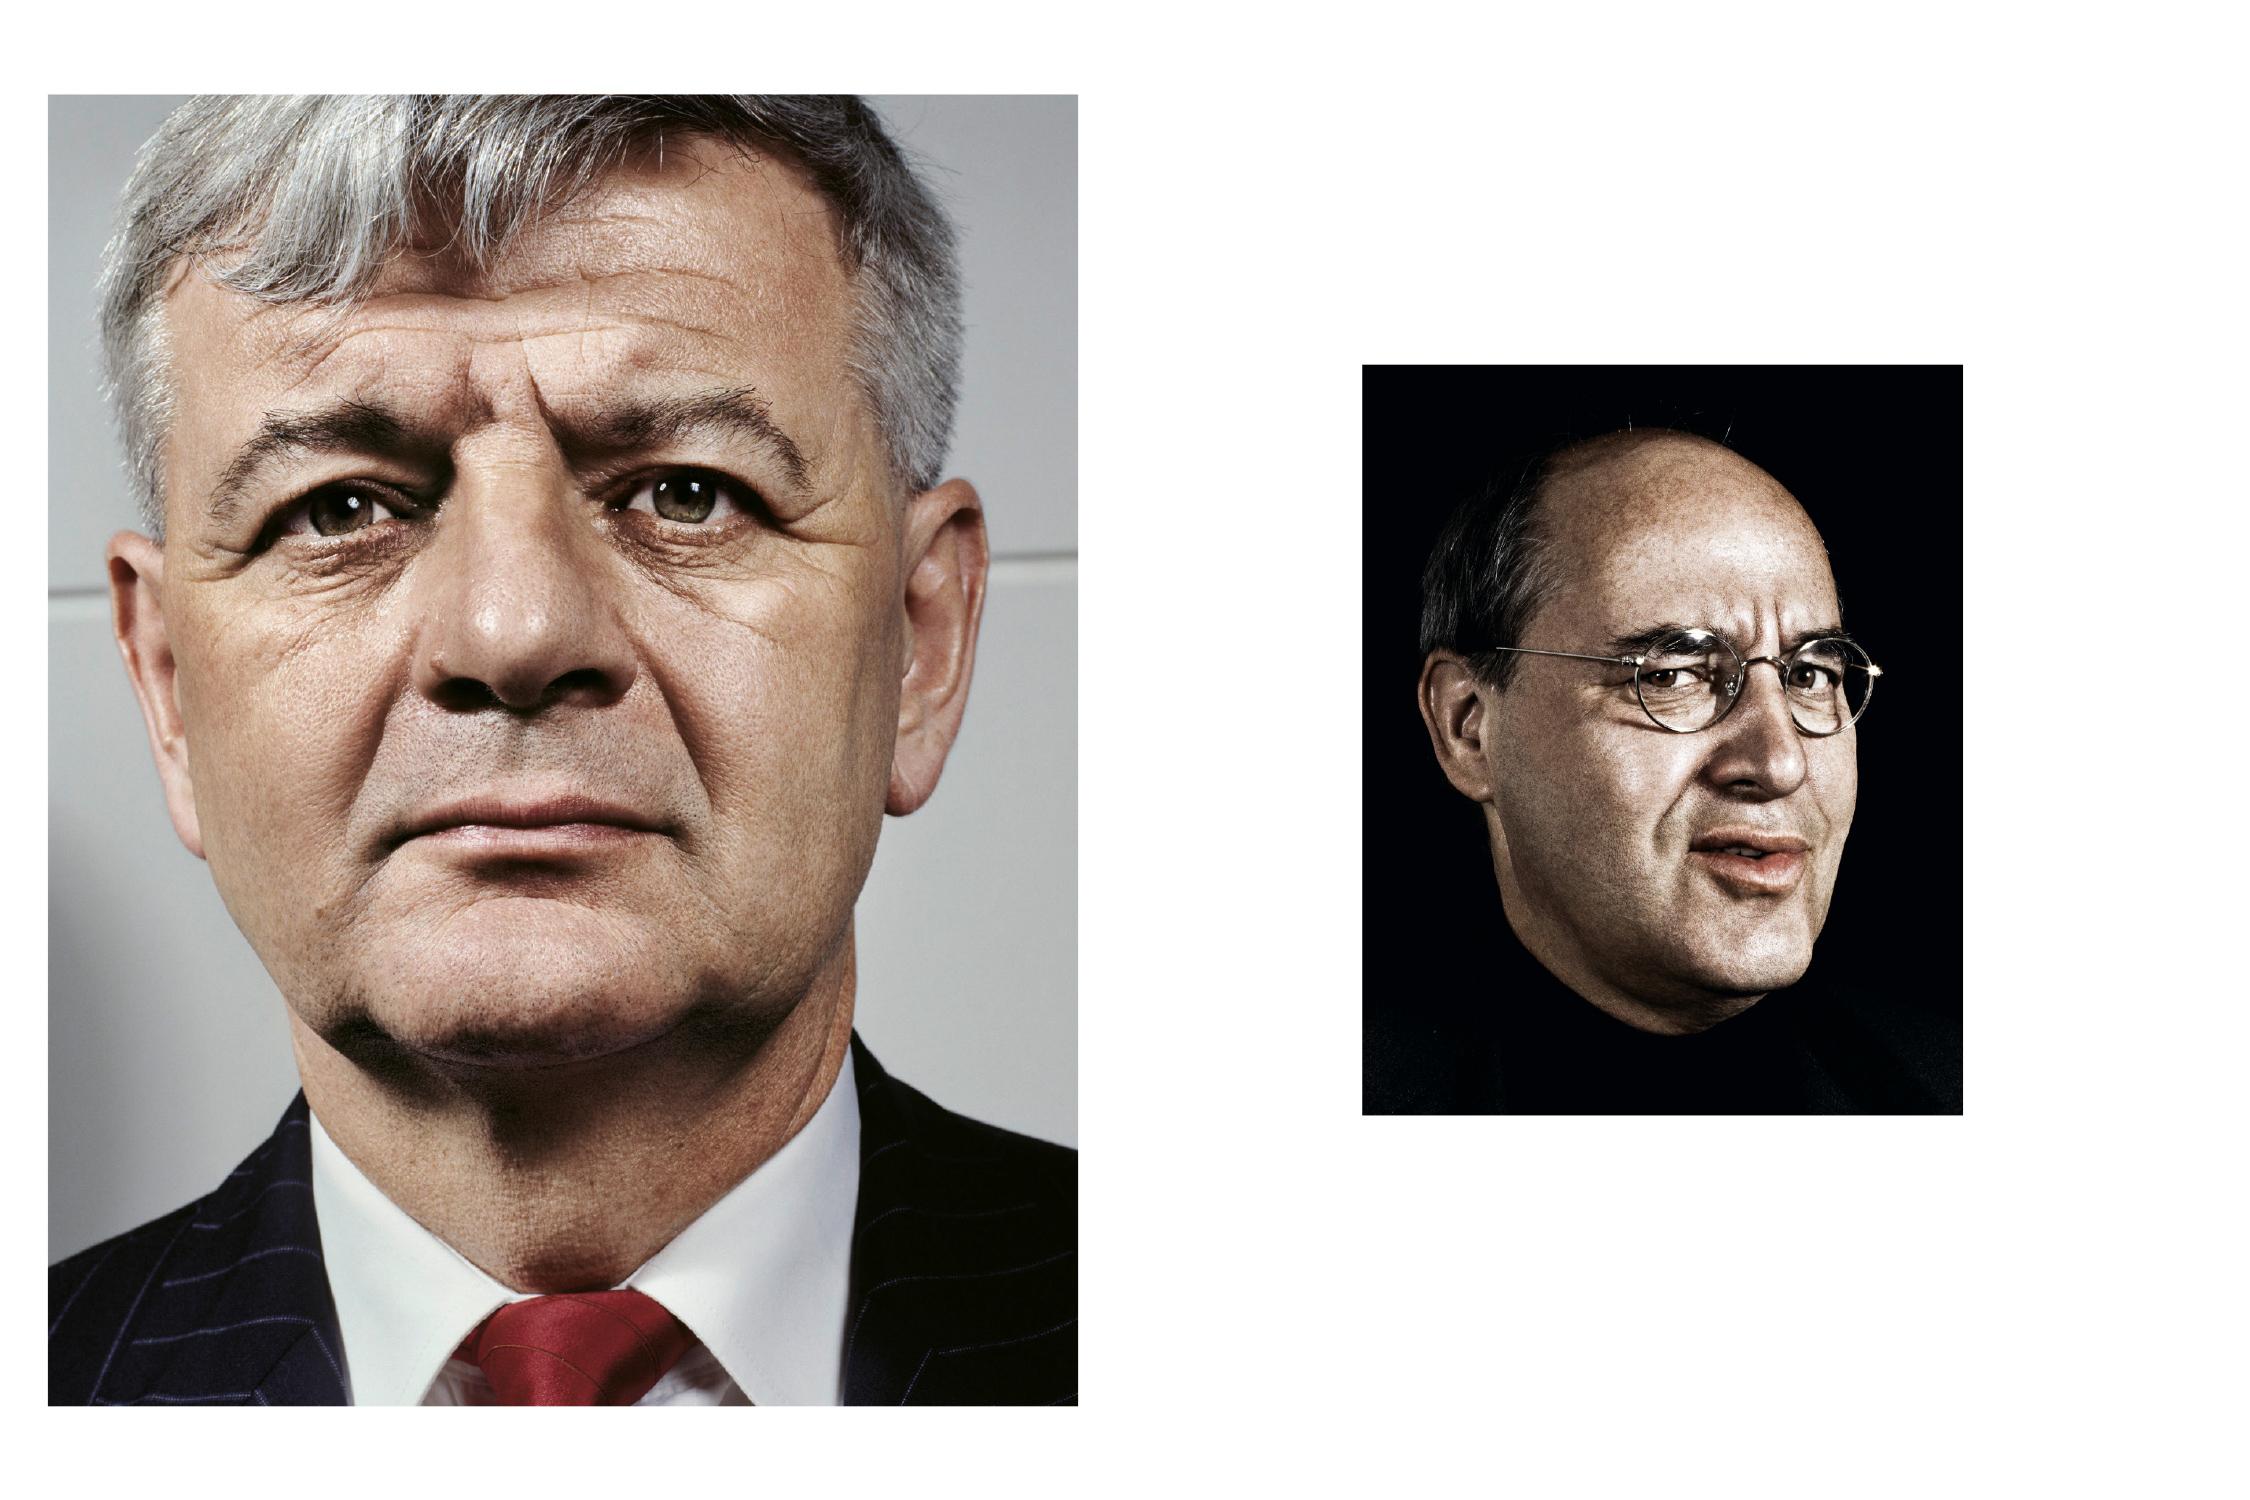 Joschka Fischer / Gregor Gysi